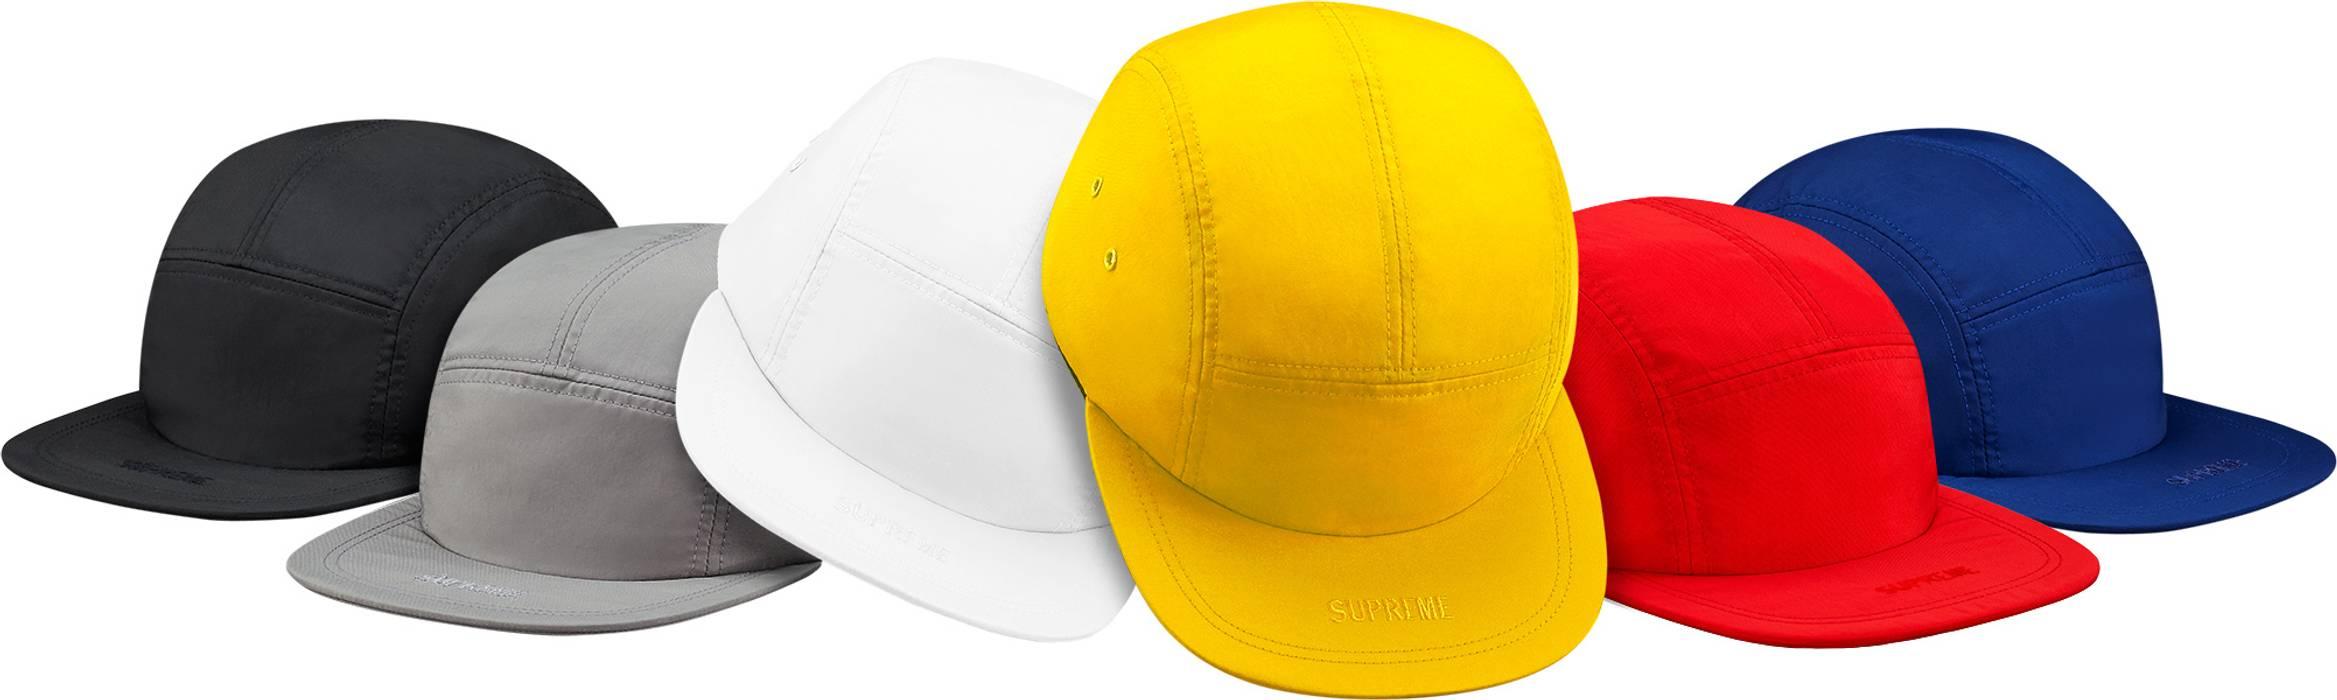 337da870fb6 Supreme Visor Logo Camp Cap Black Size one size - Hats for Sale ...